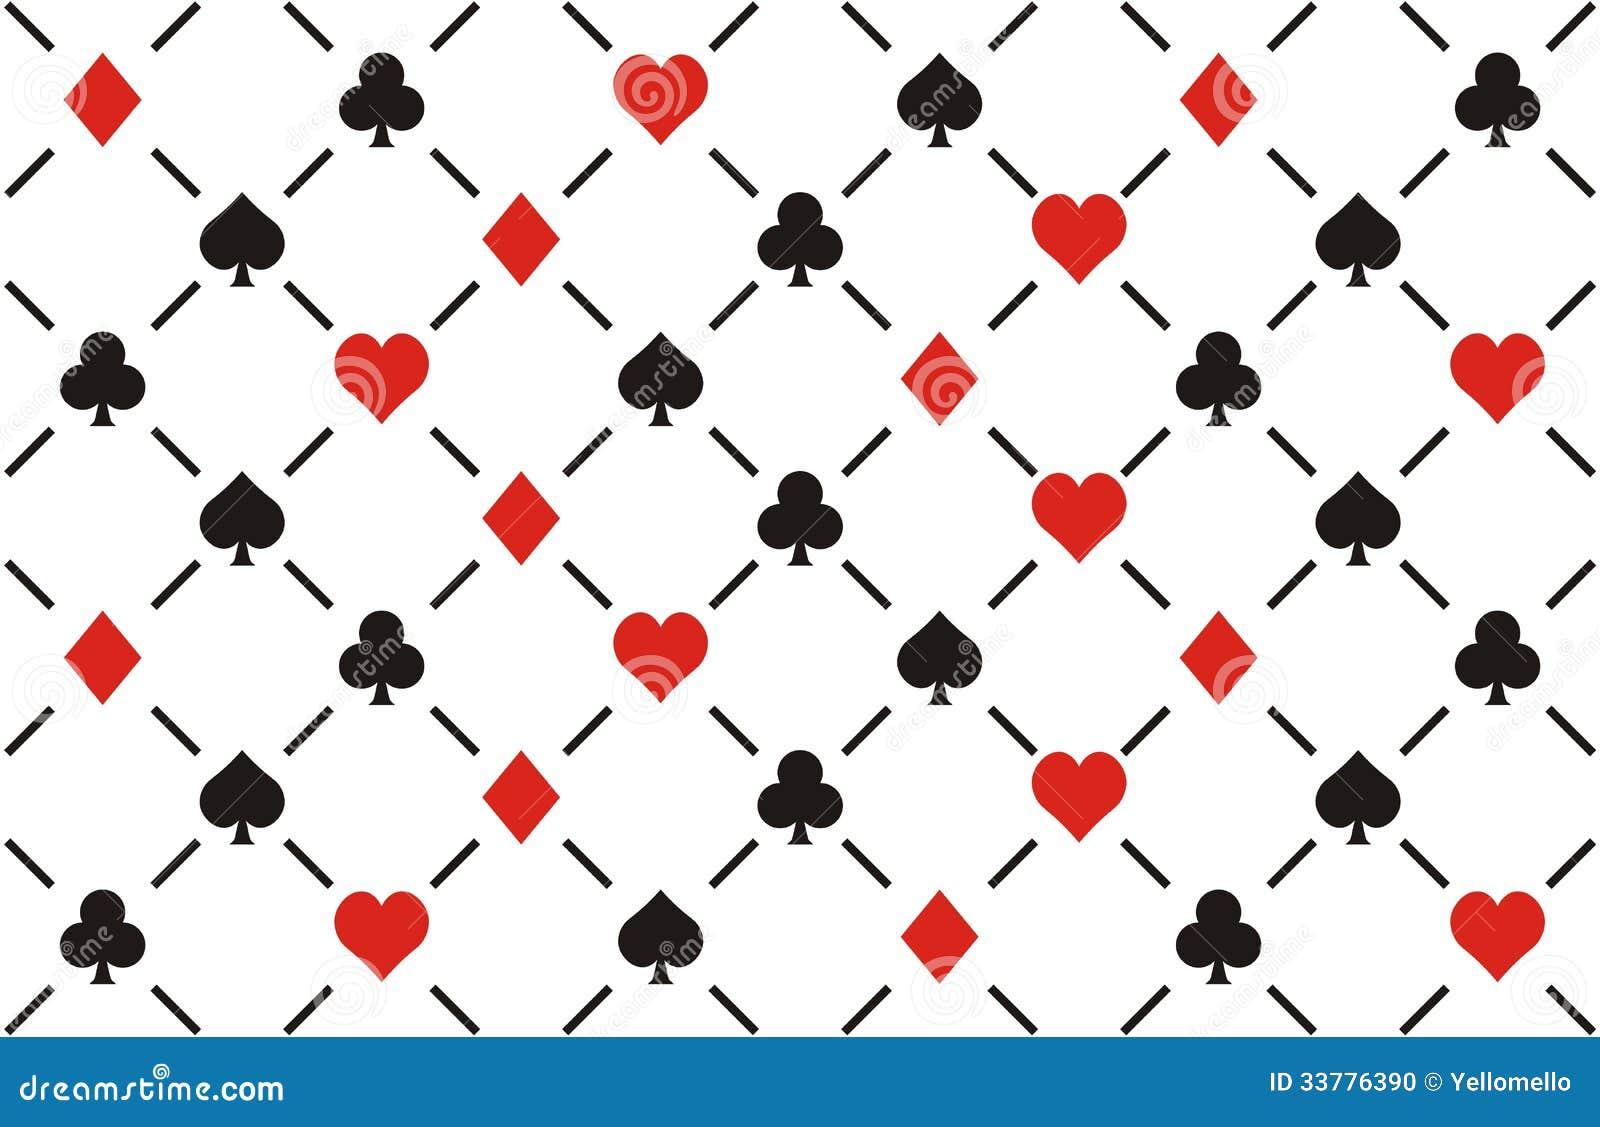 clubs diamonds hearts and spades seamless patt stock vector